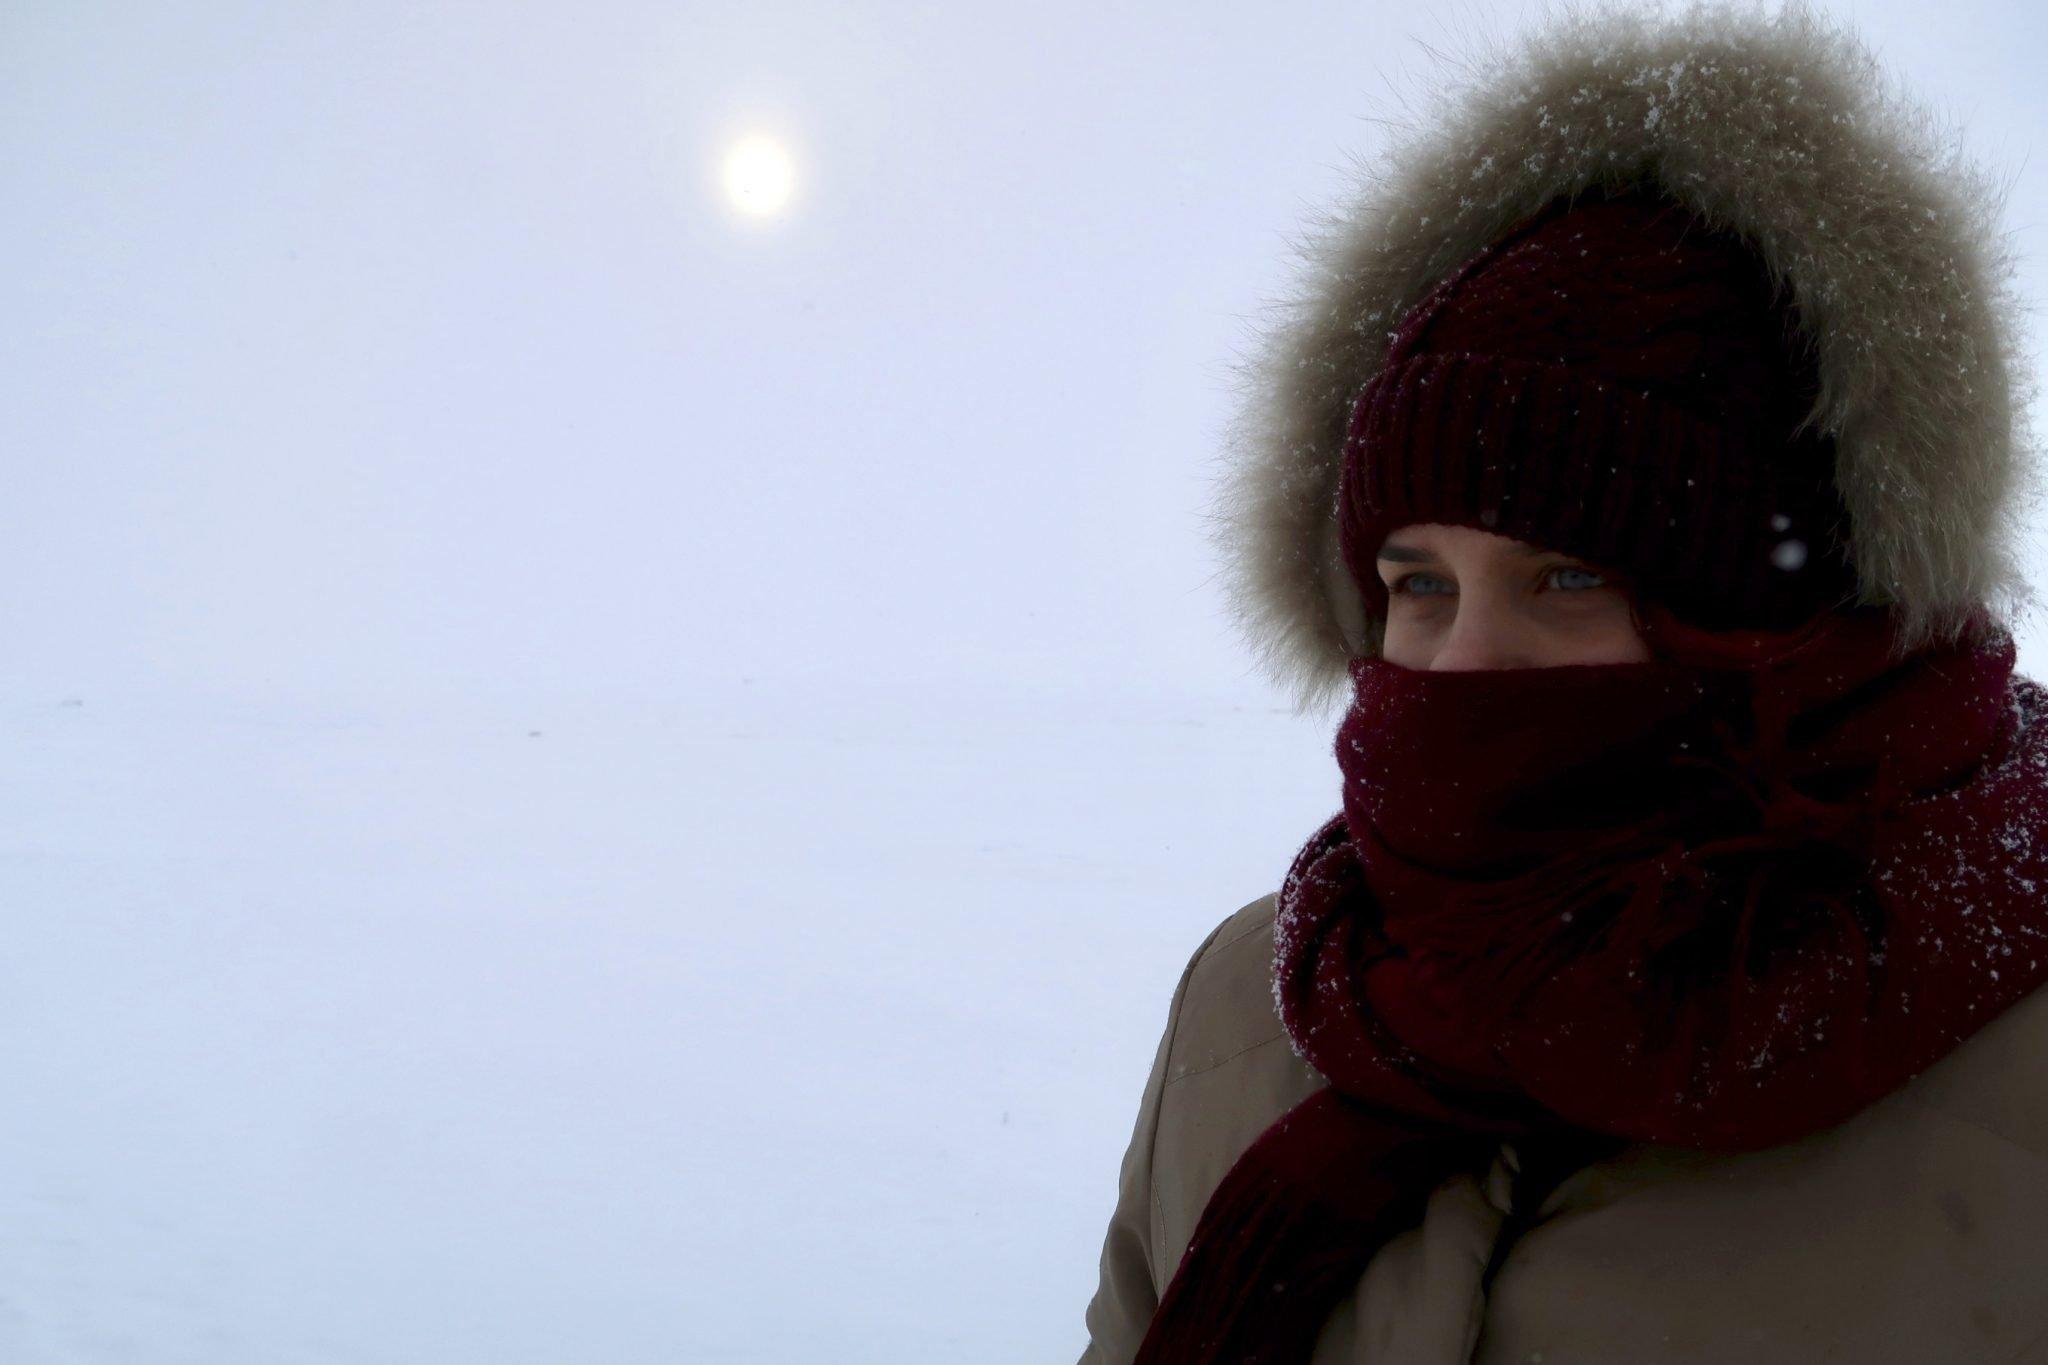 Pärnu merenranta talvi